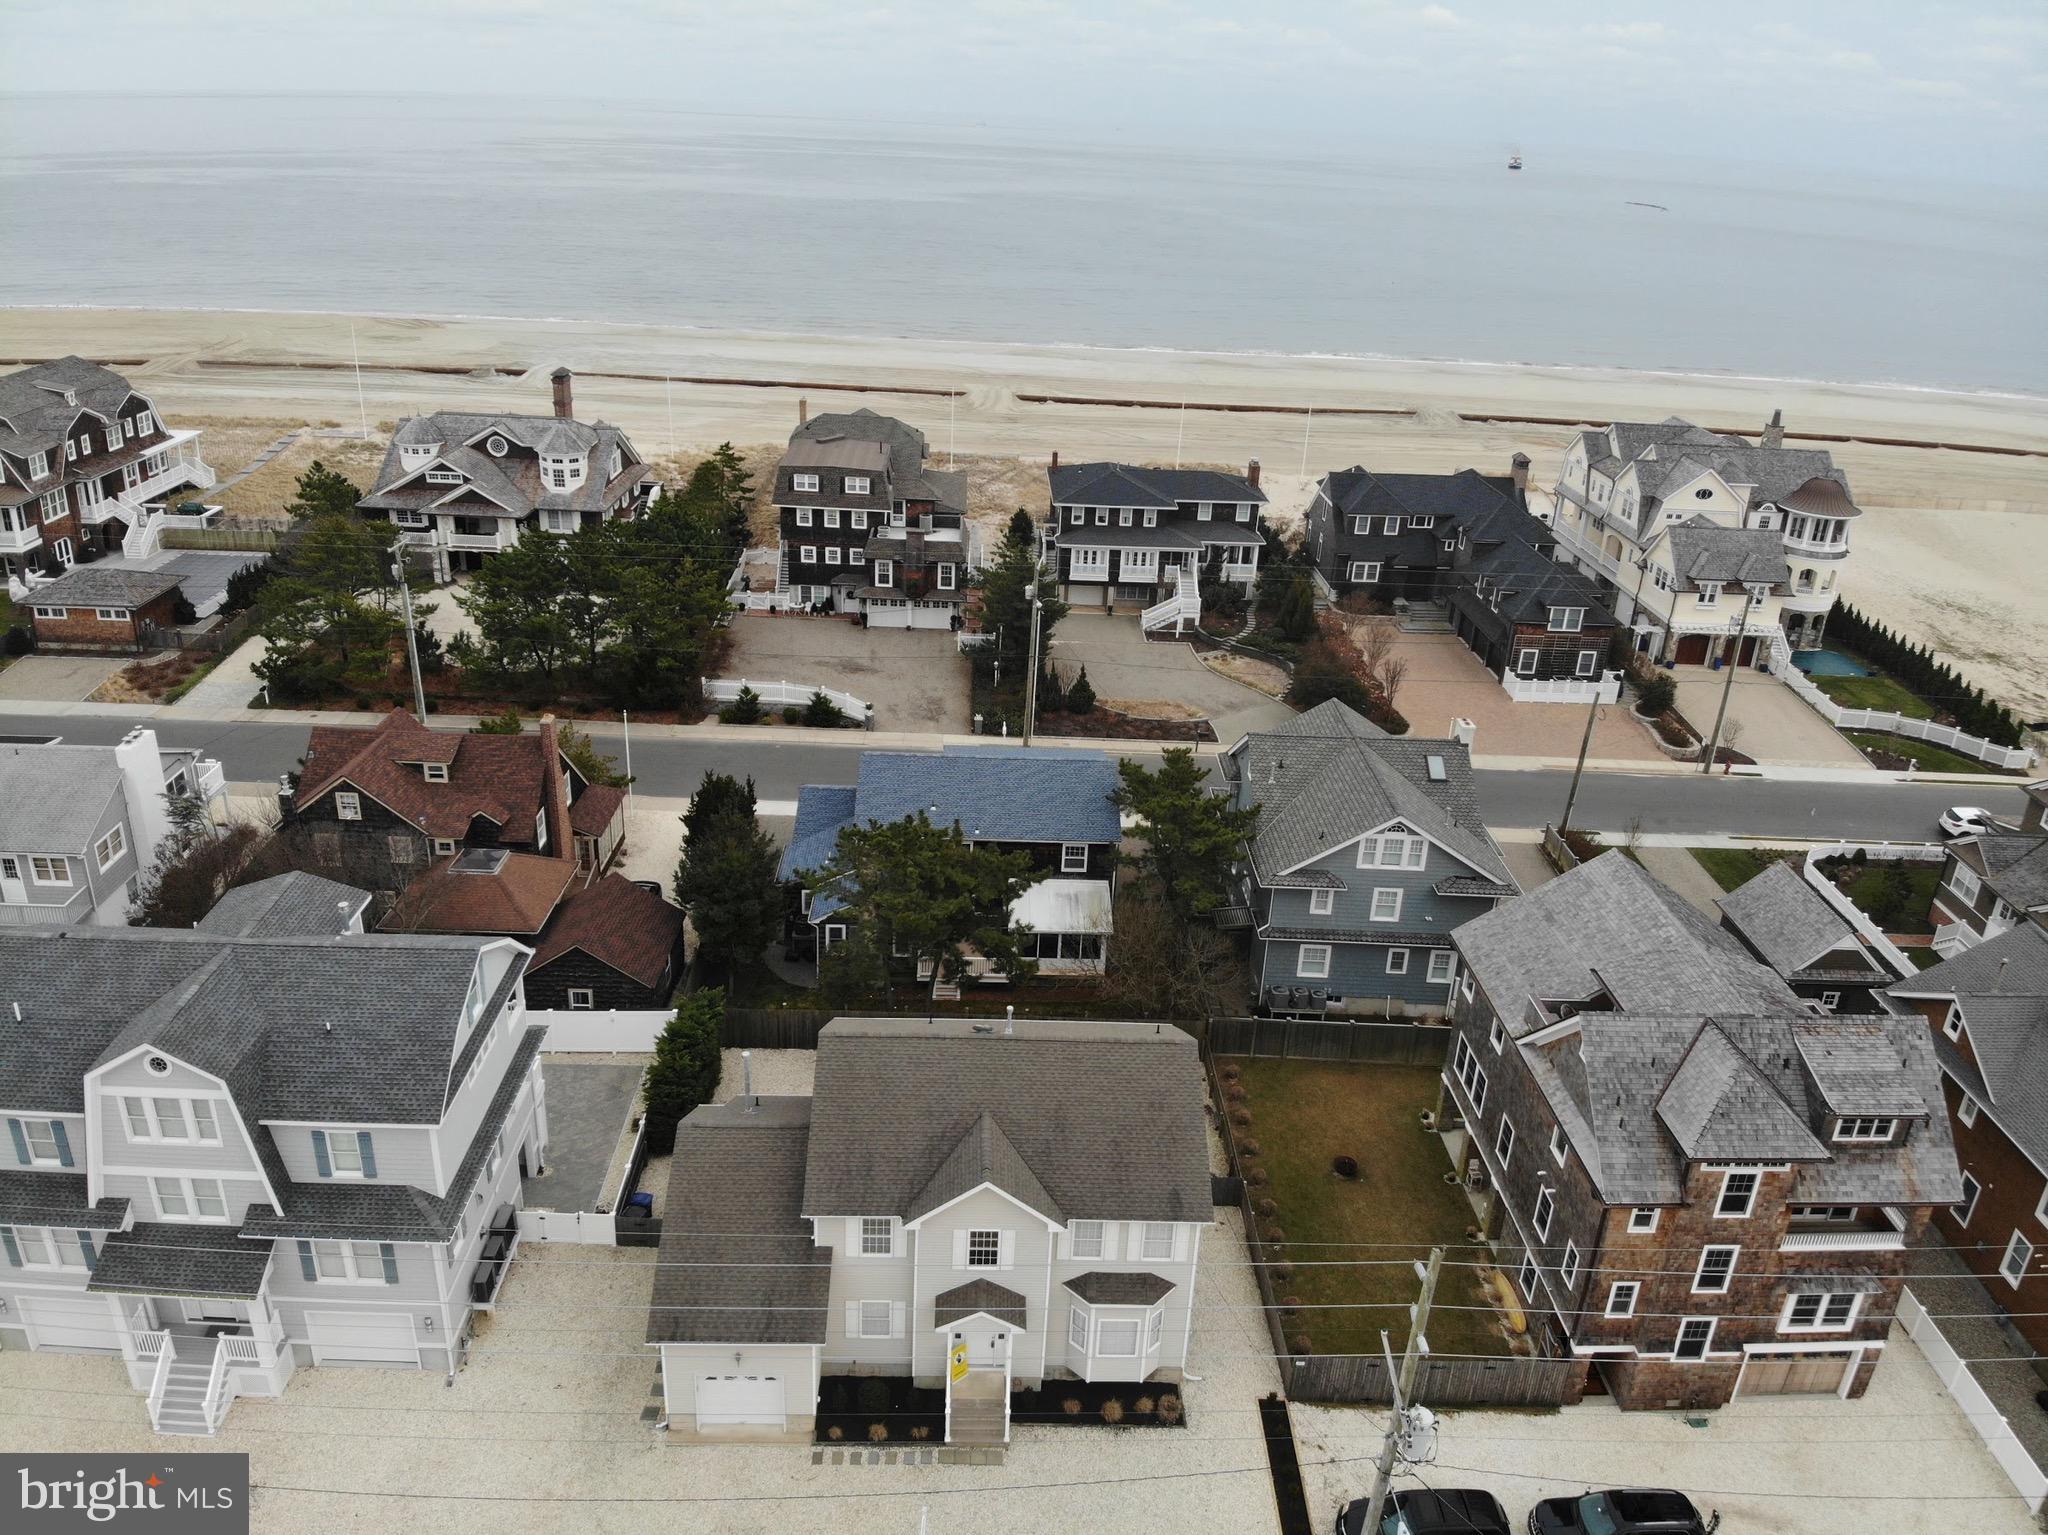 979 OCEAN AVENUE, MANTOLOKING, NJ 08738